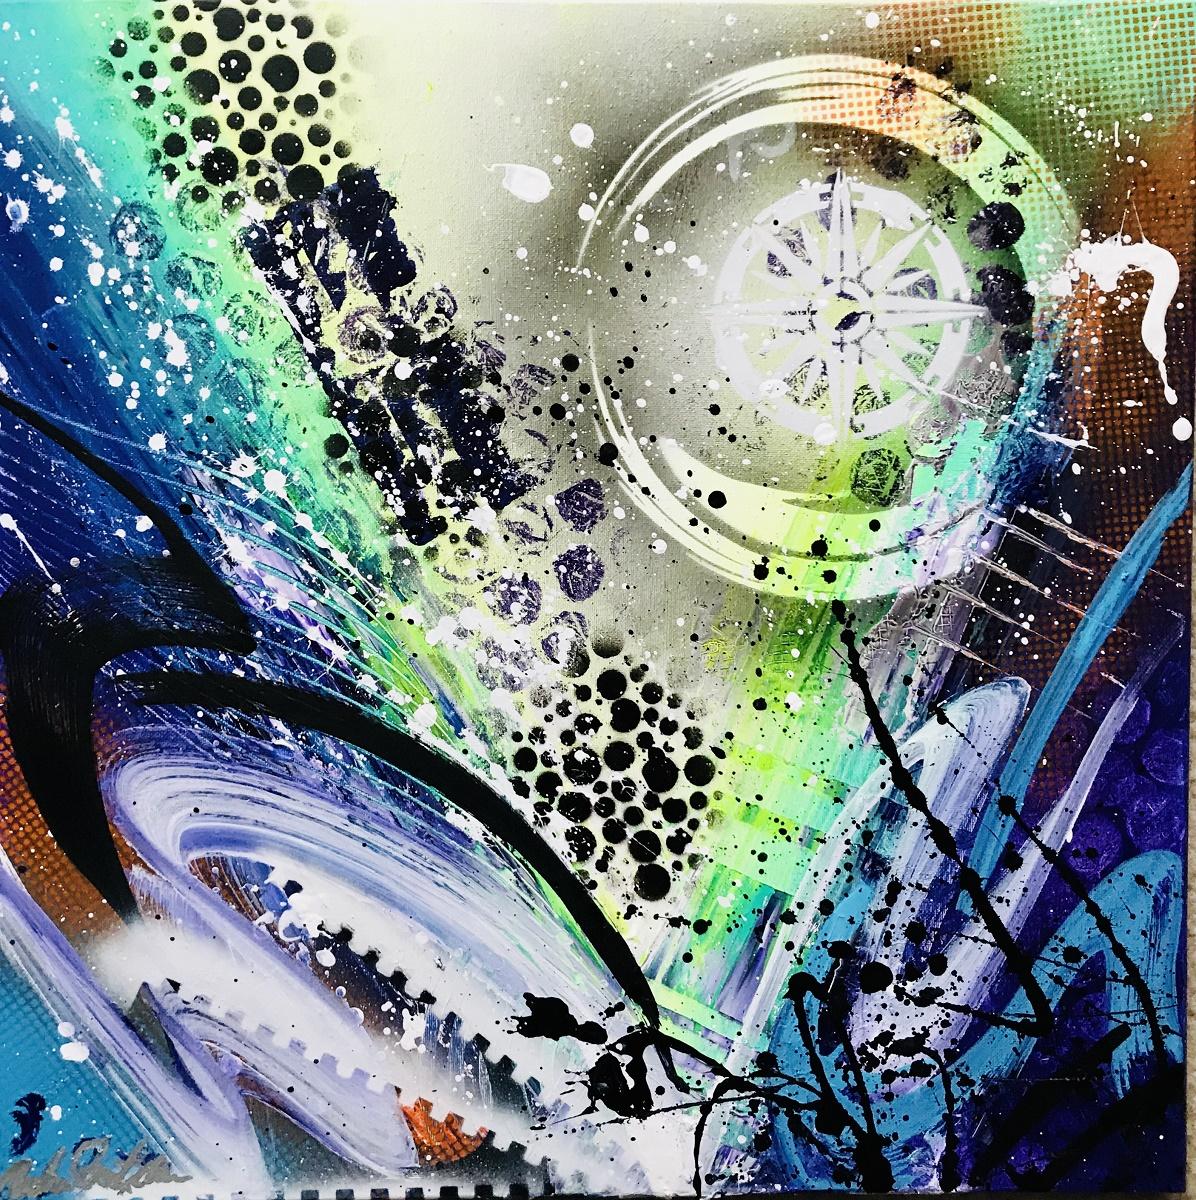 Punkmetal Abstract by Abraham Darlington